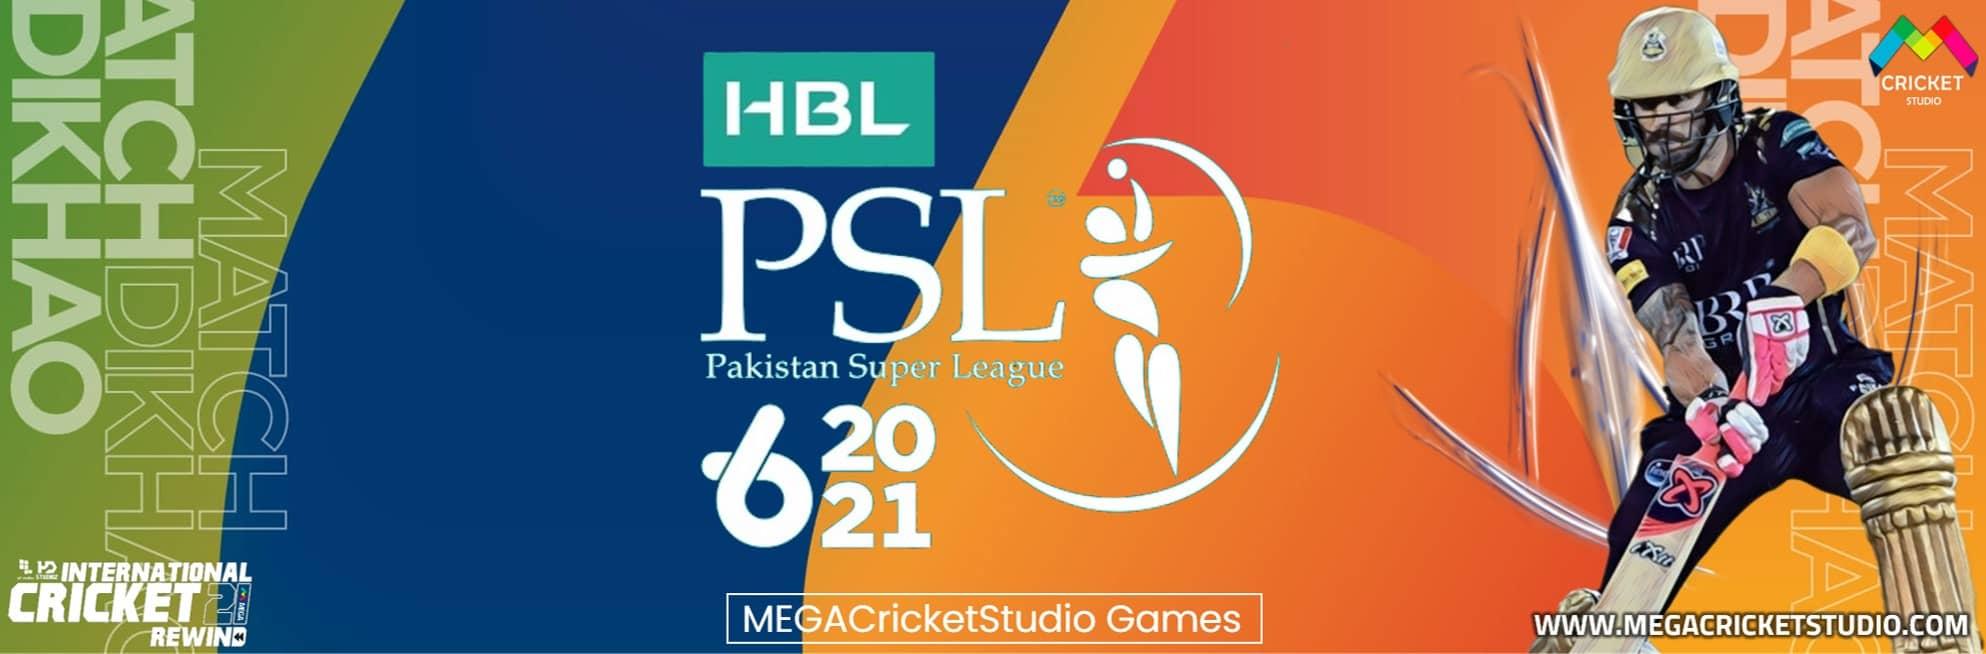 hbl psl 2021 patch free download ea cricket 07